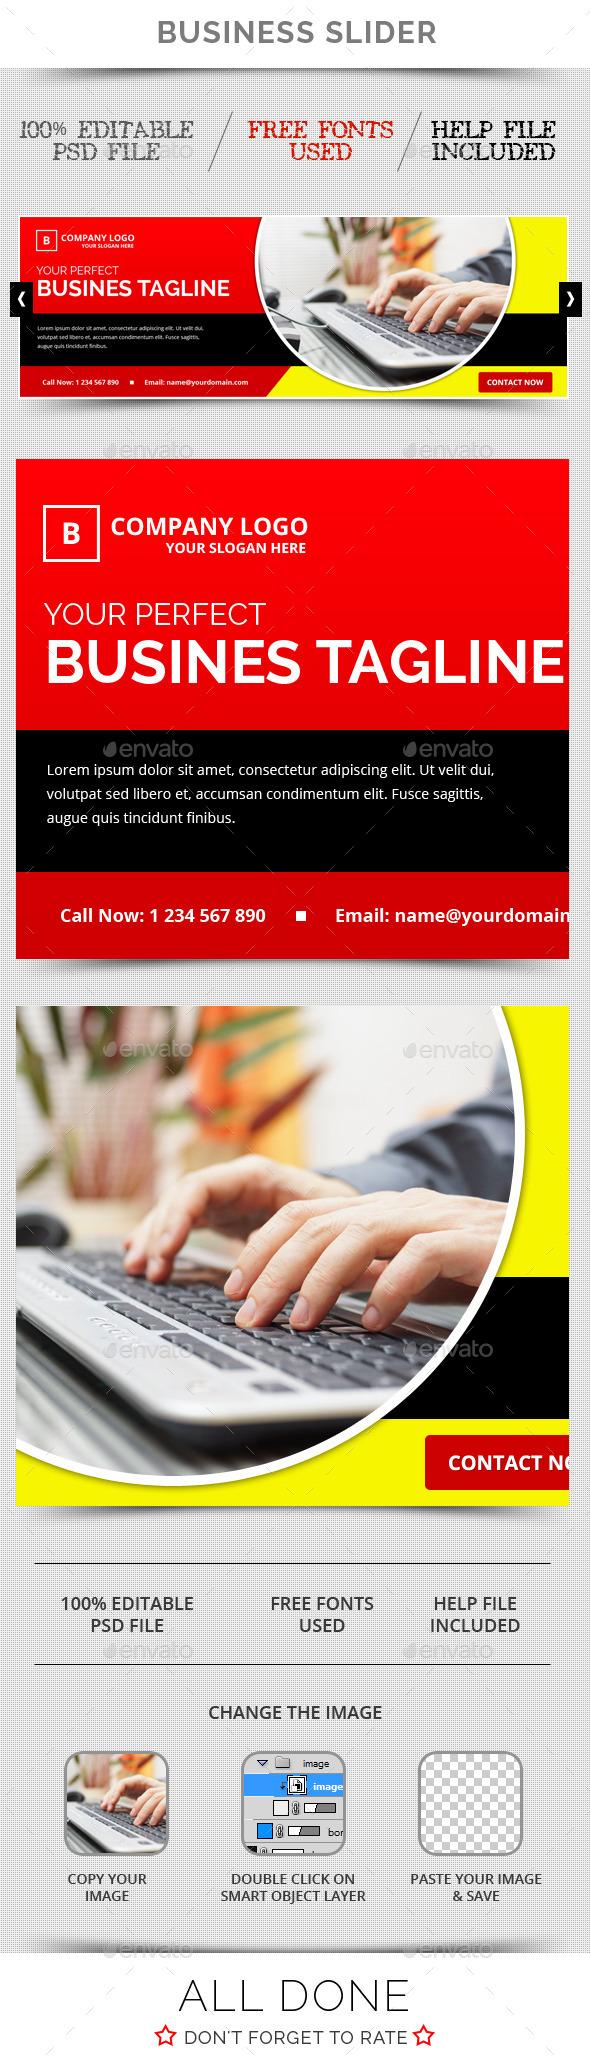 GraphicRiver Business Slider V23 11769872